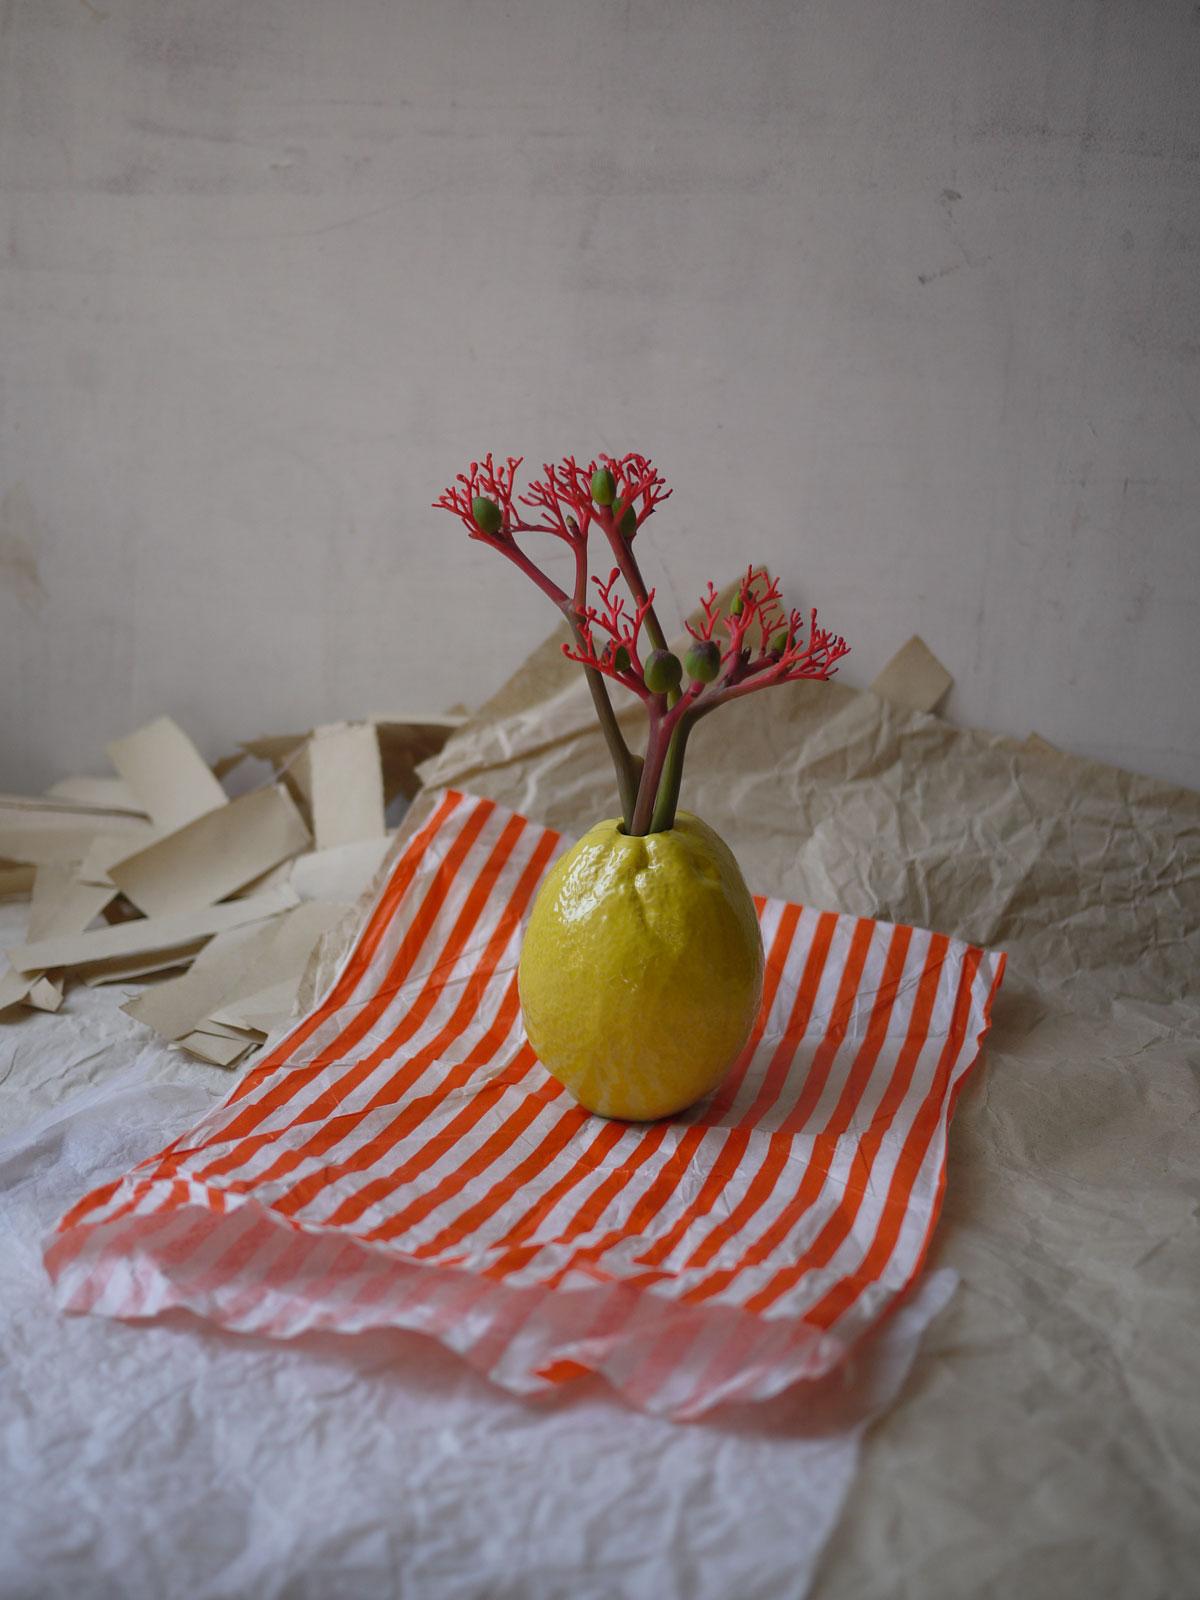 Bracelets LOOM - Design textile by Myriam Balaÿ myriam-balay-lundi FRENCH STYLE L'appartement